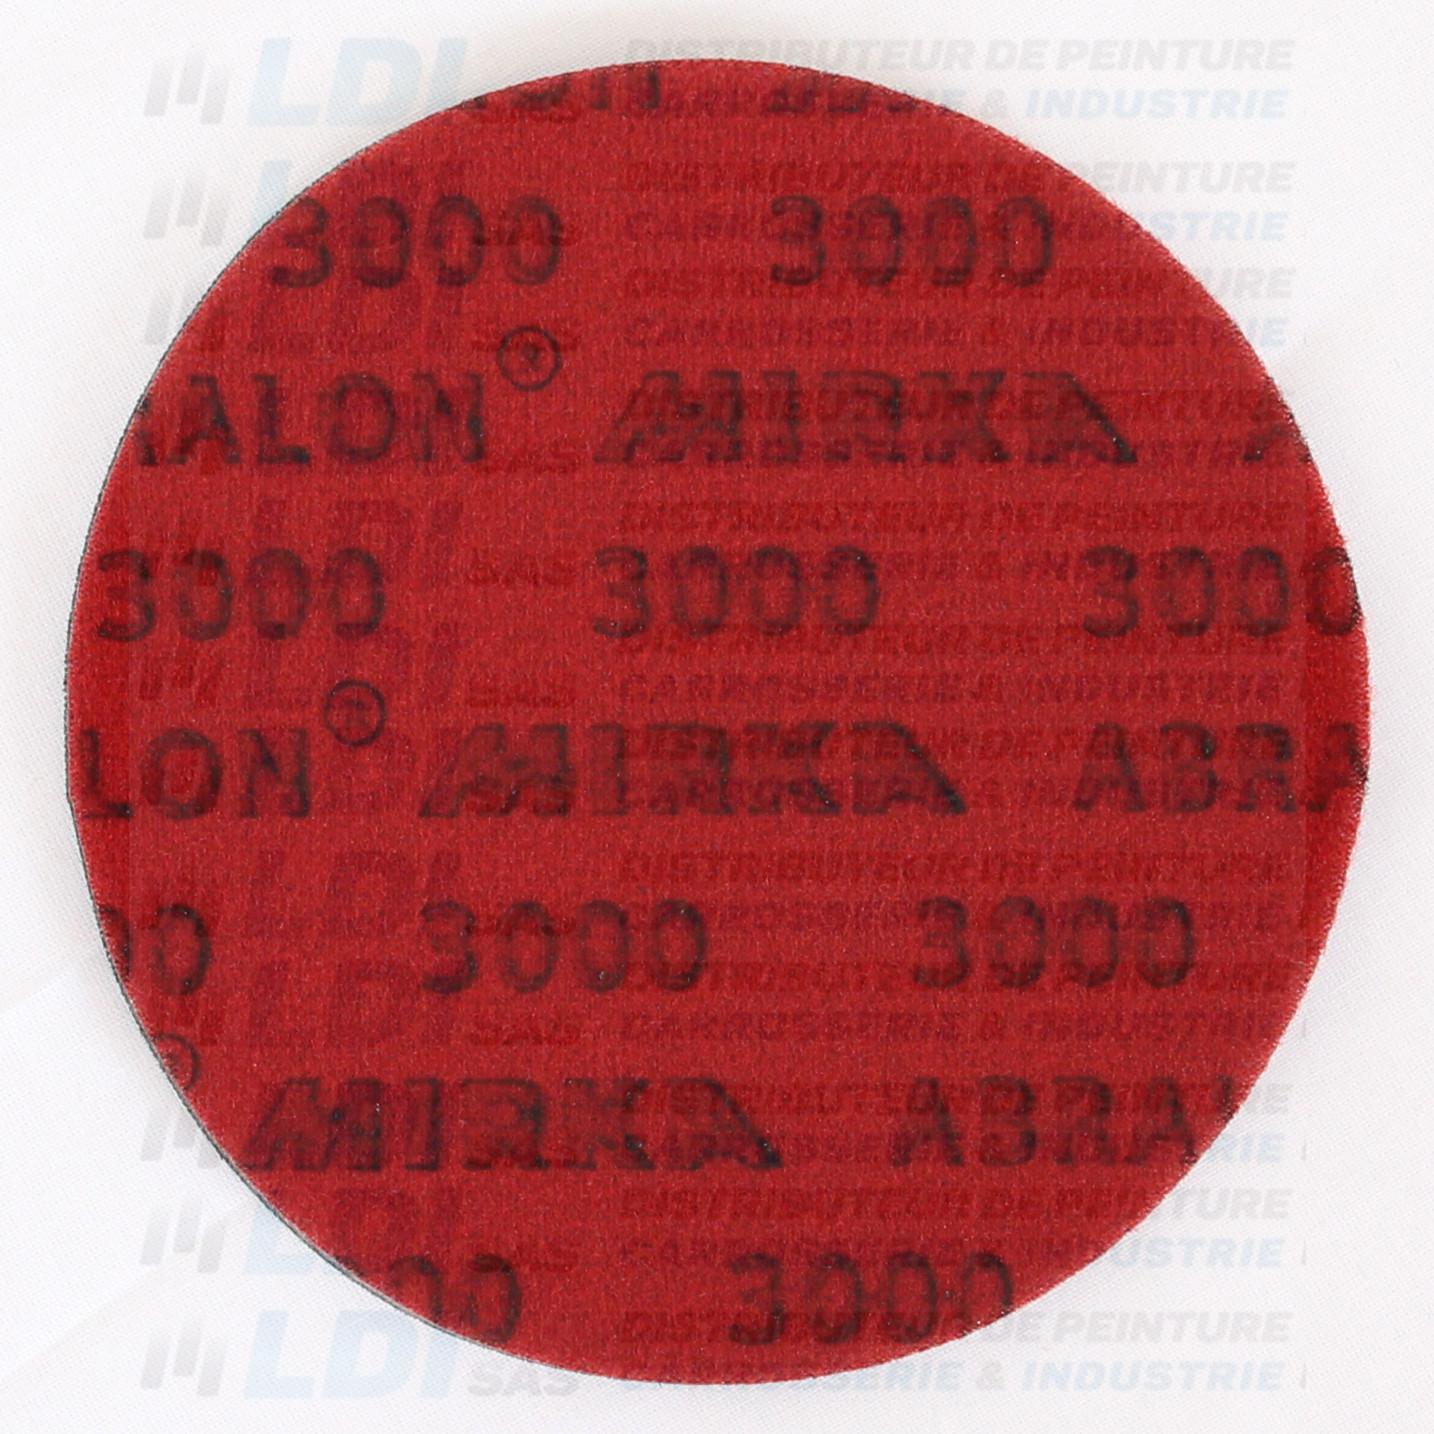 DISQUE ABRALON D150 P4000 X20